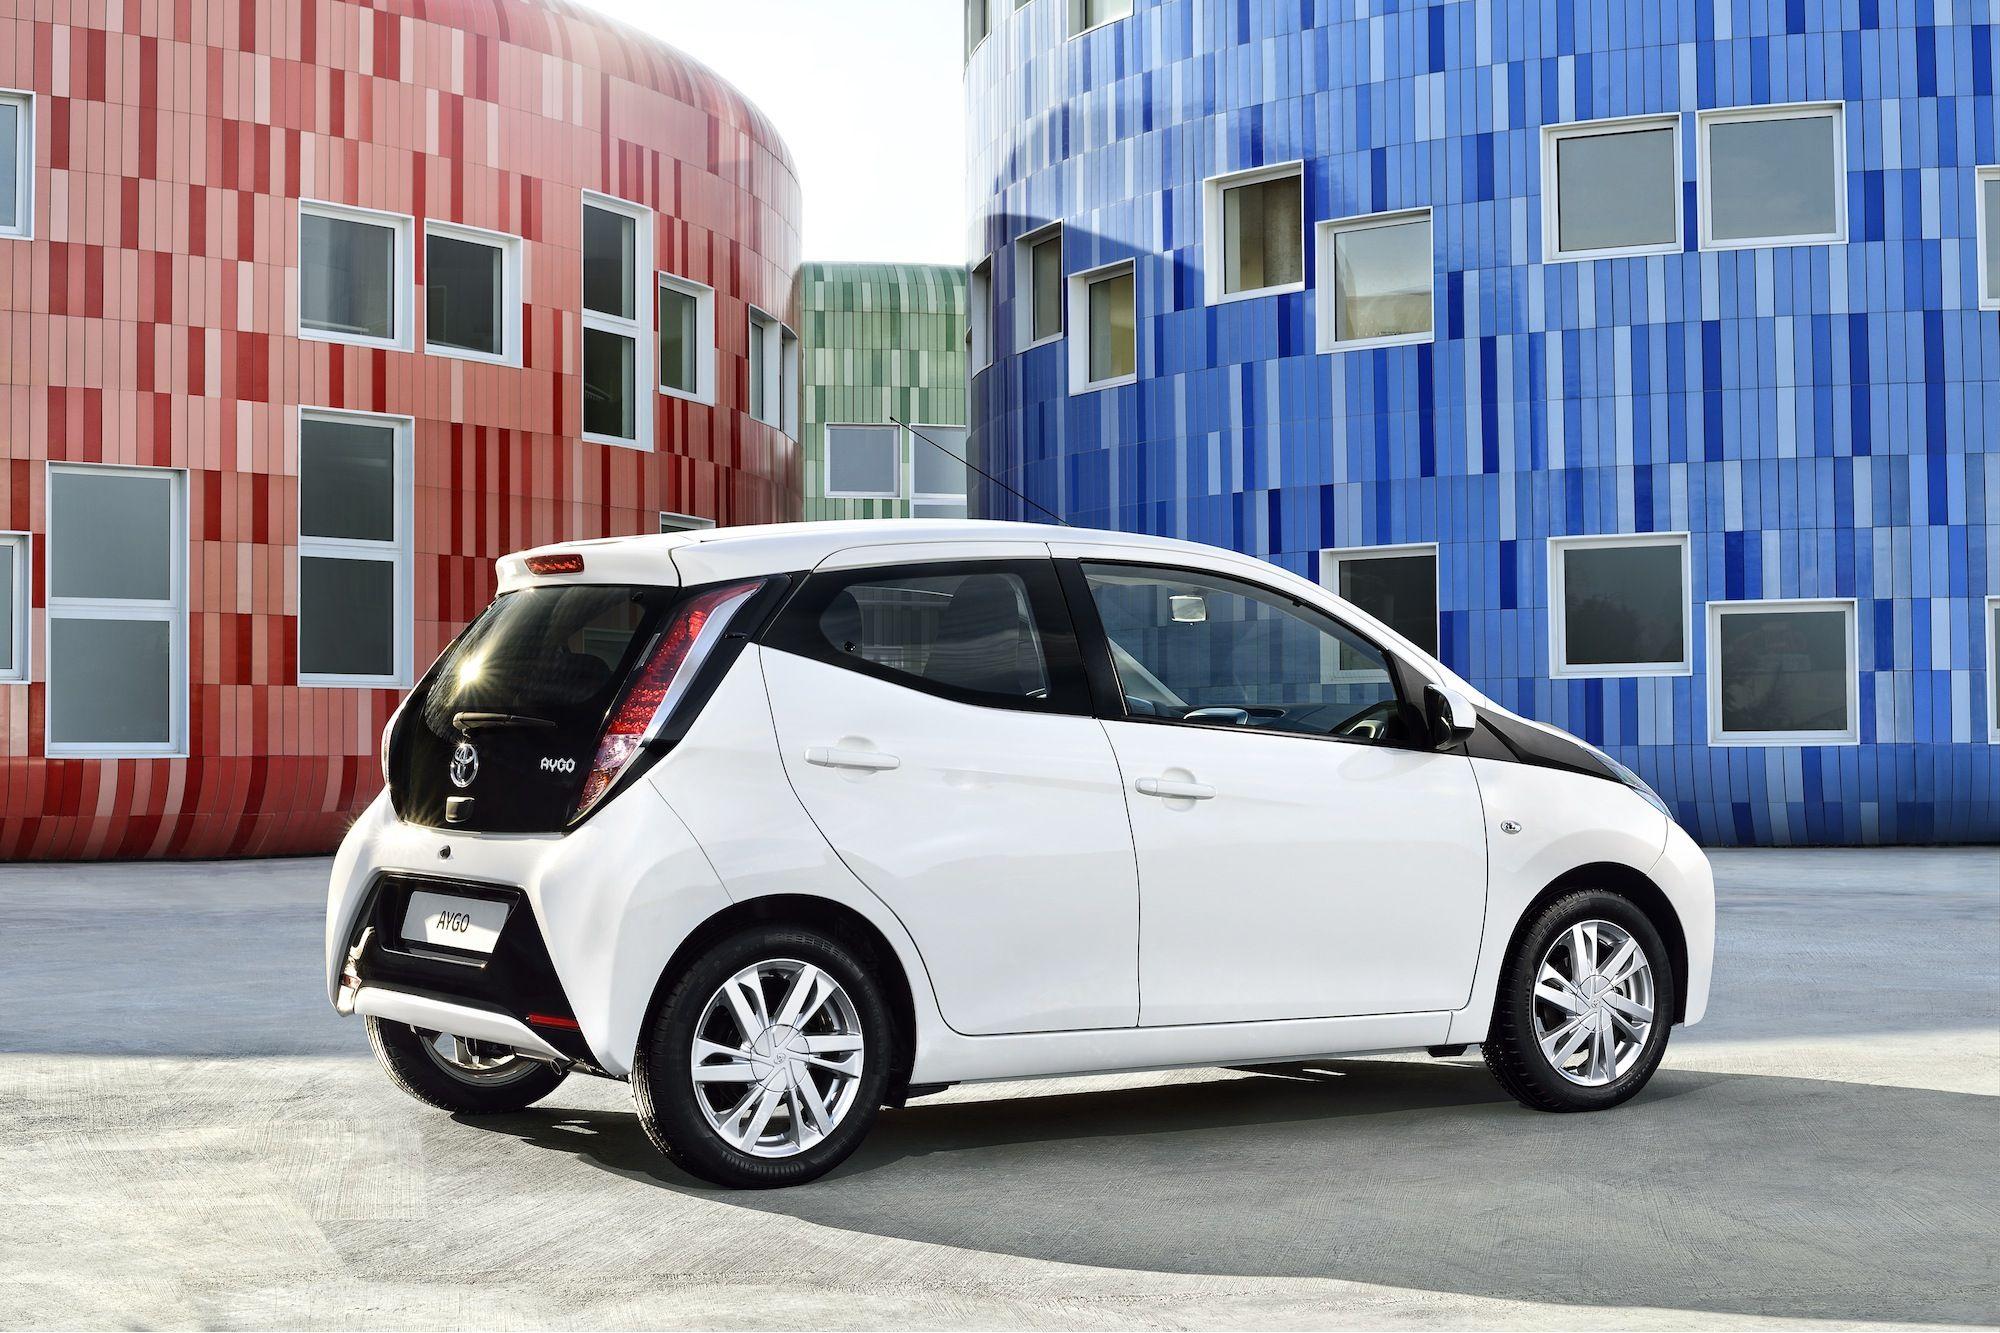 All New Toyota Aygo Revealed Toyota Aygo City Car Car Paint Jobs